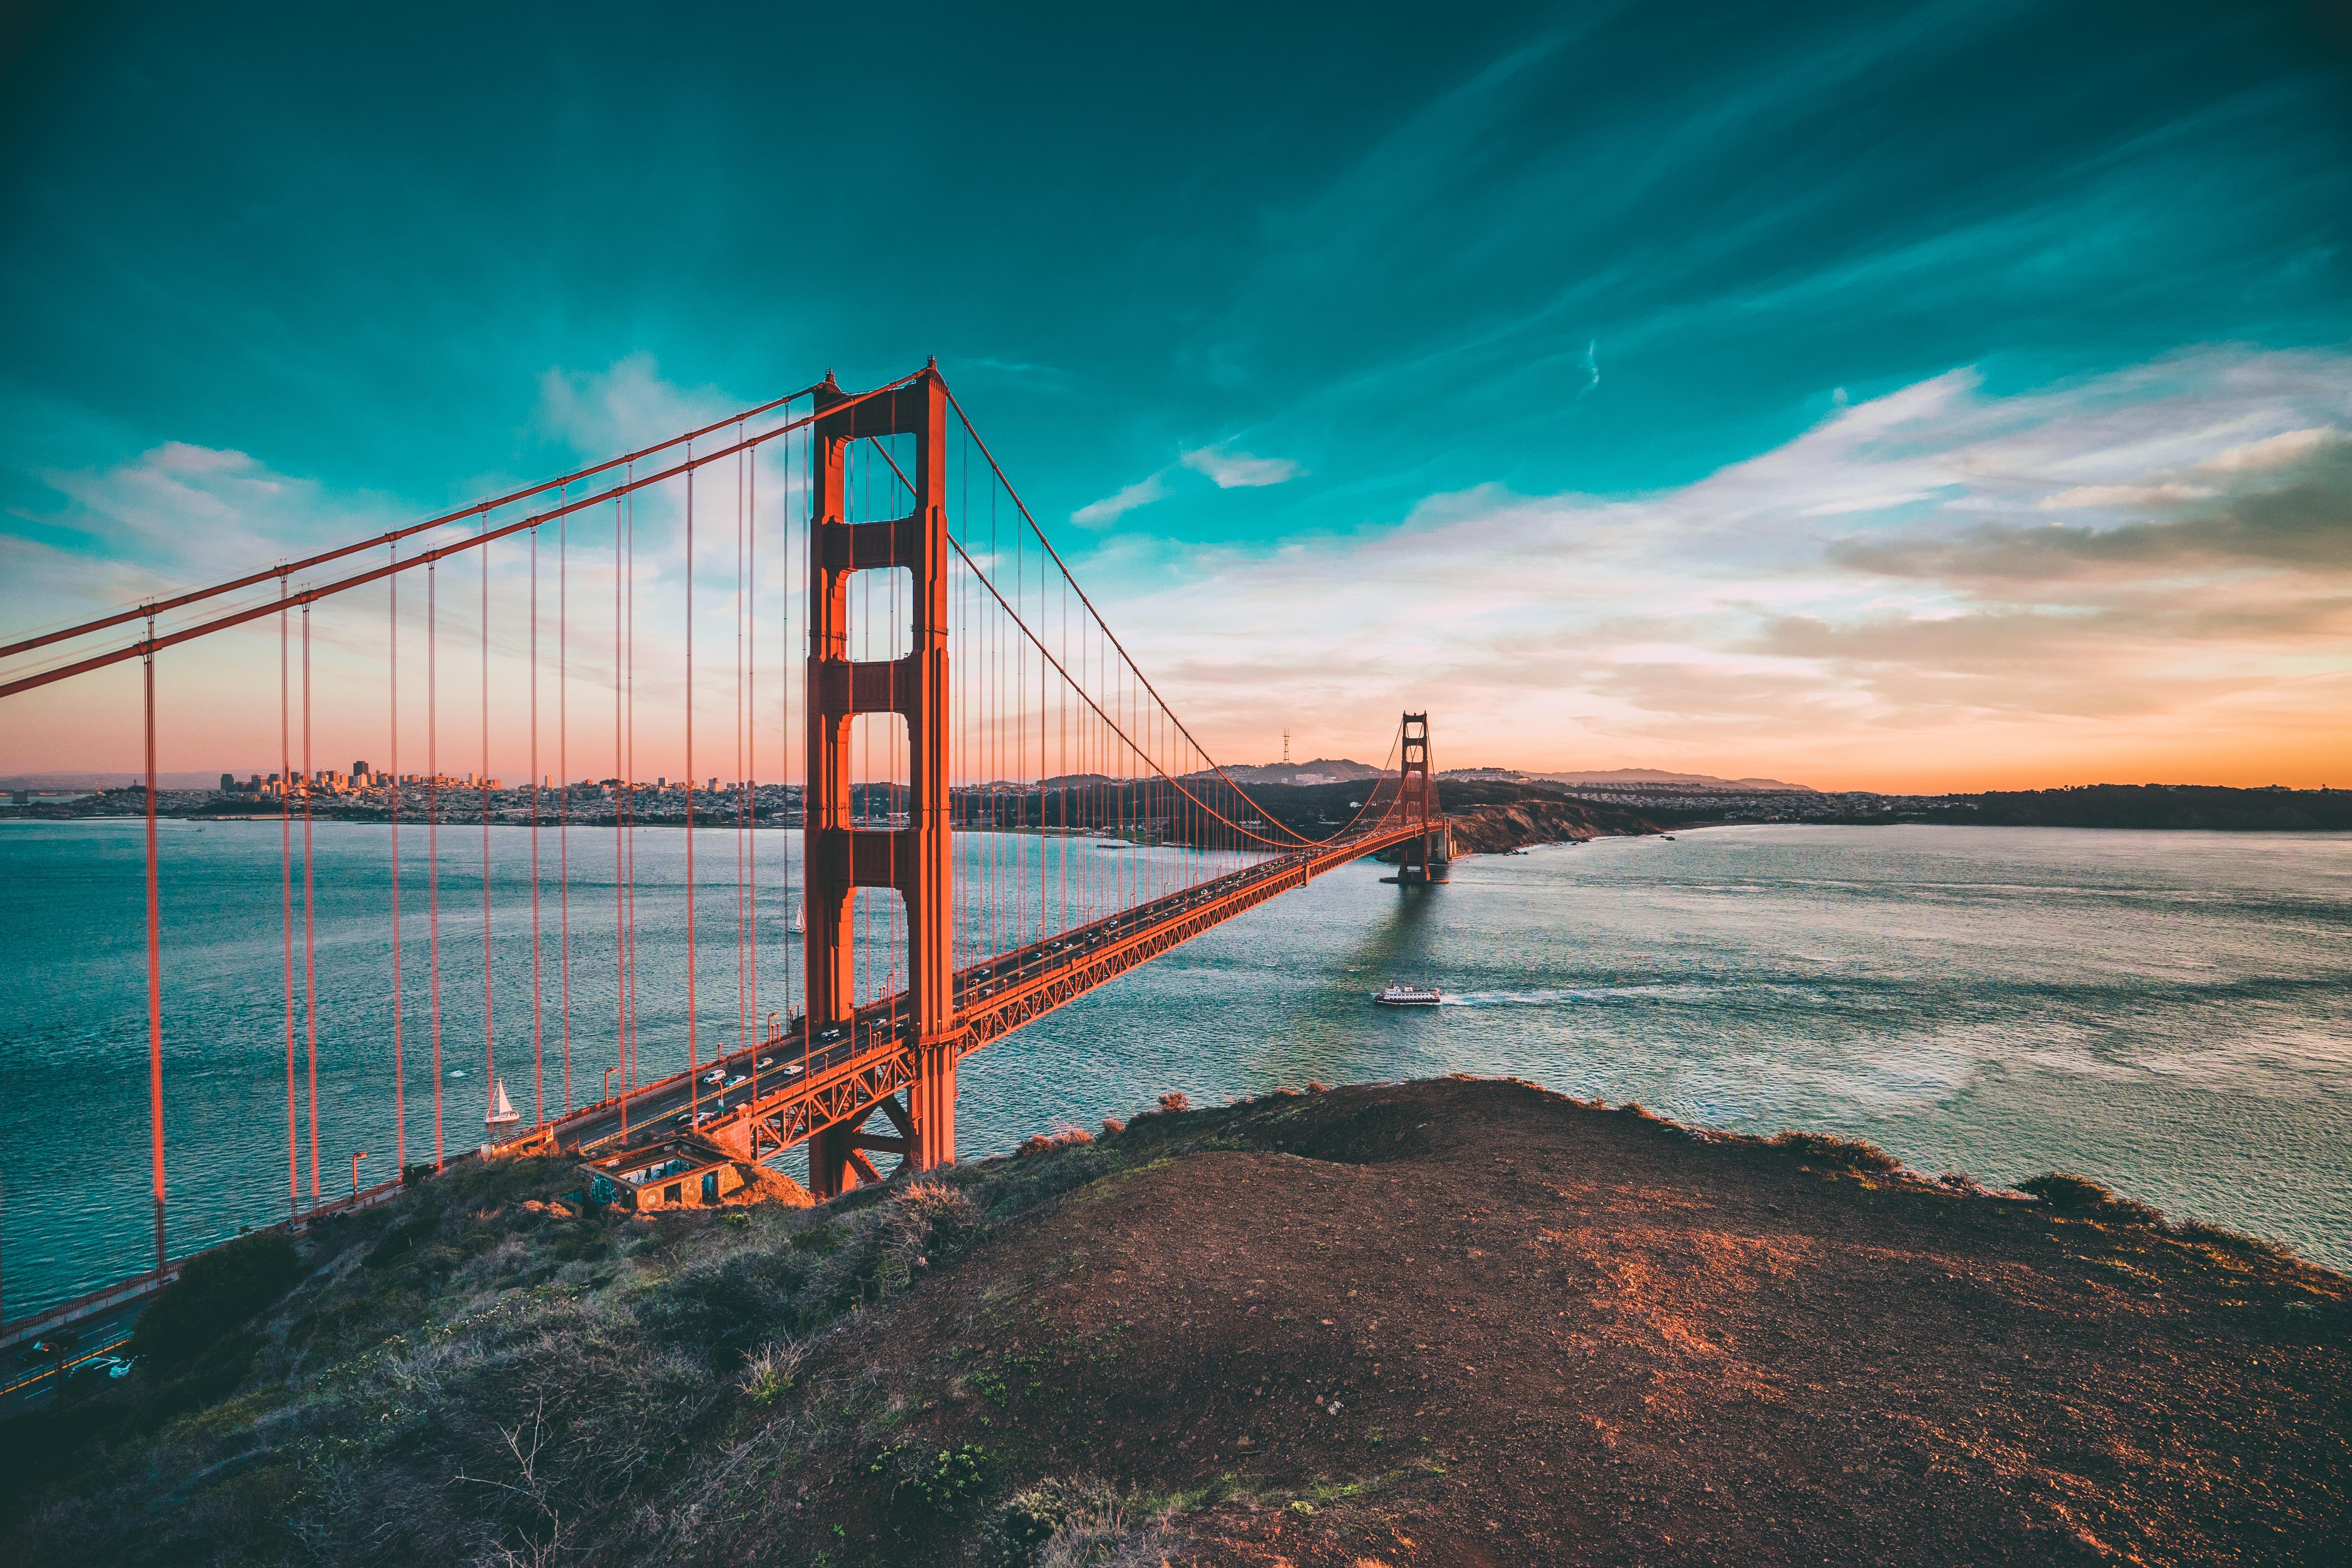 San Francisco Headlands And Golden Gate Bridge Fancycrave